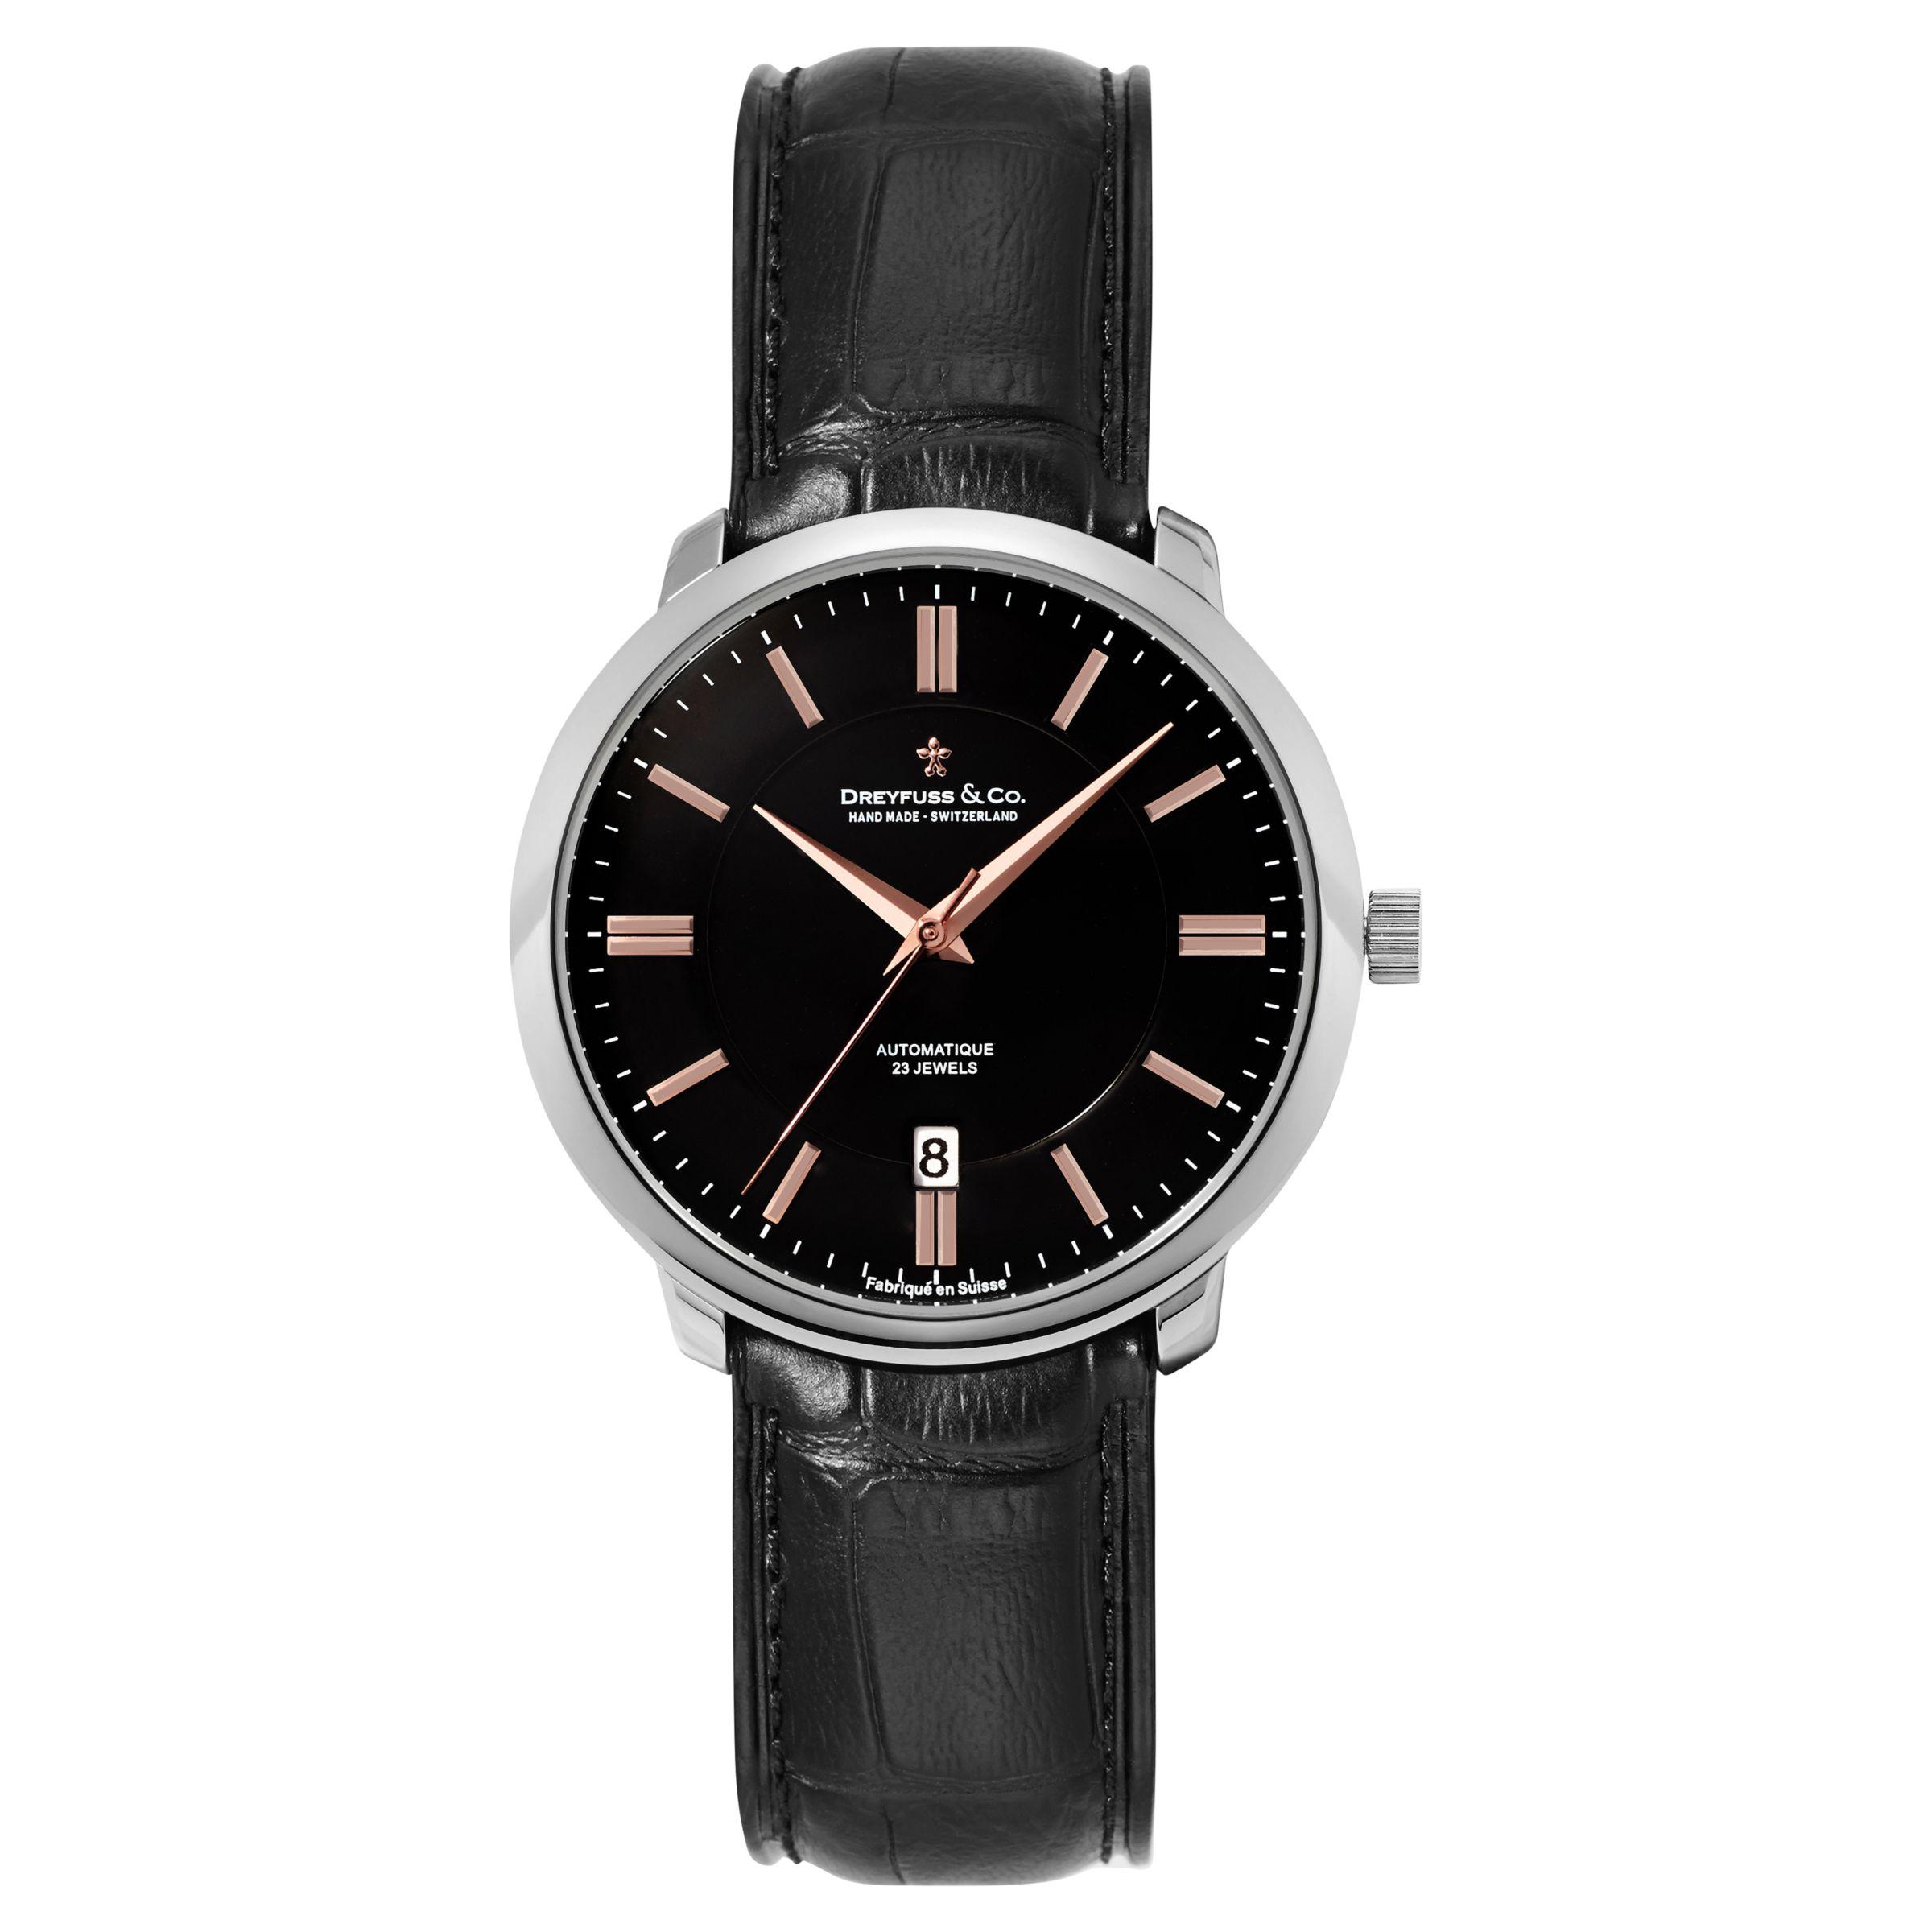 Dreyfuss & Co Dreyfuss & Co Men's 1925 Automatic Leather Strap Watch